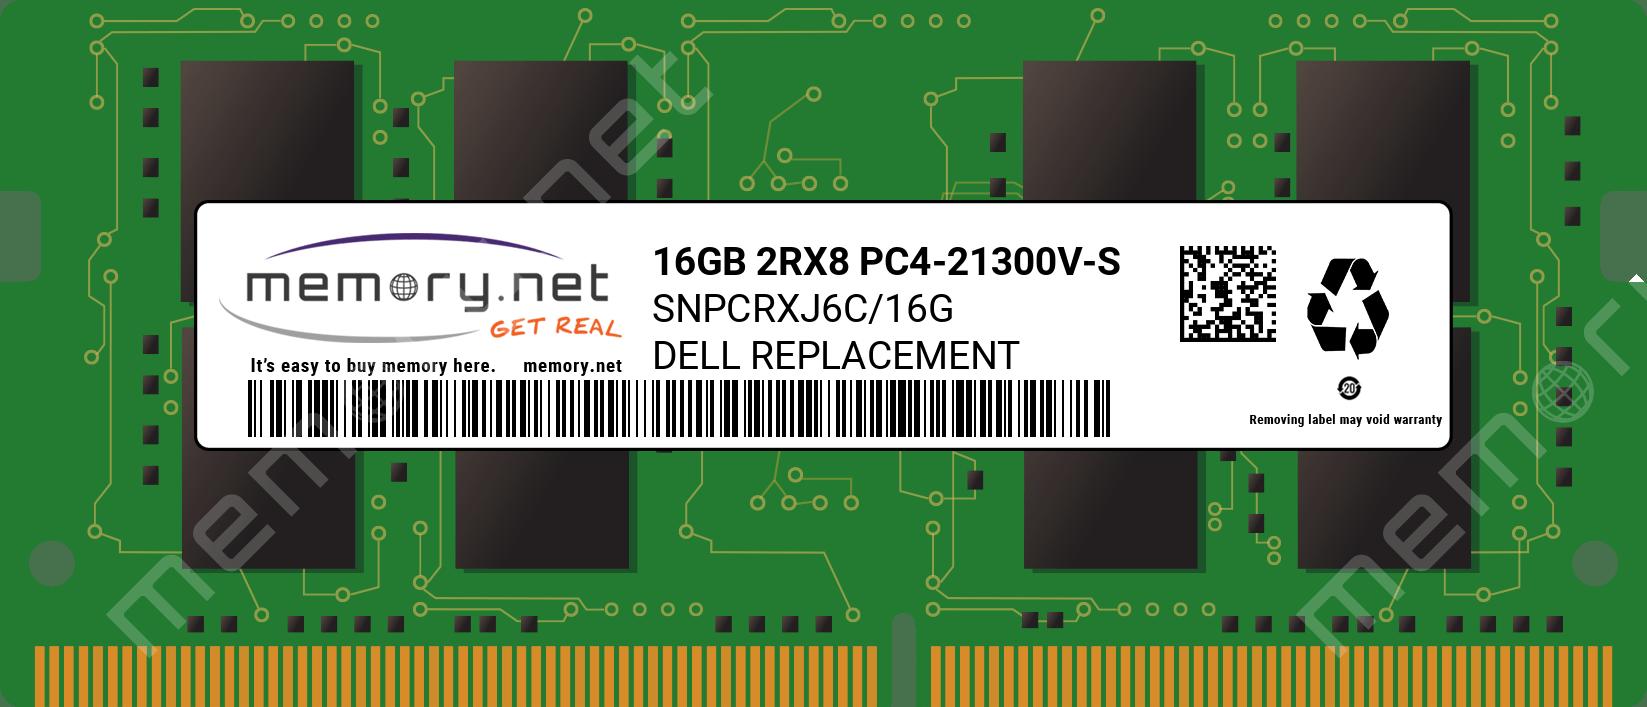 SNPCRXJ6C/16G